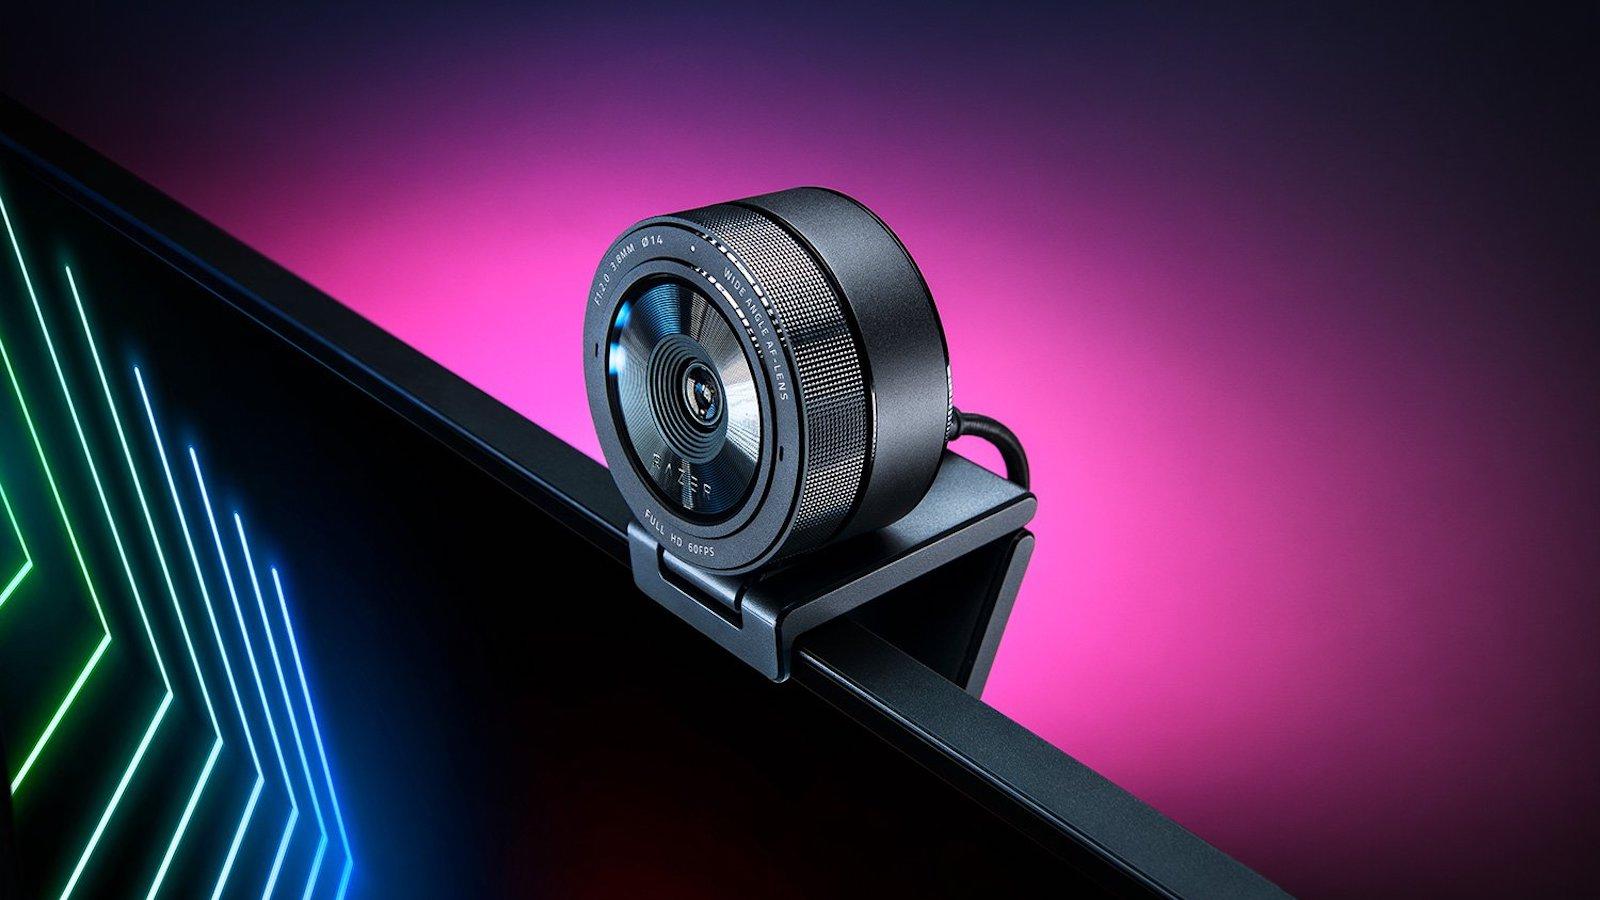 Razer-Kiyo-Pro-USB-camera-01.jpg